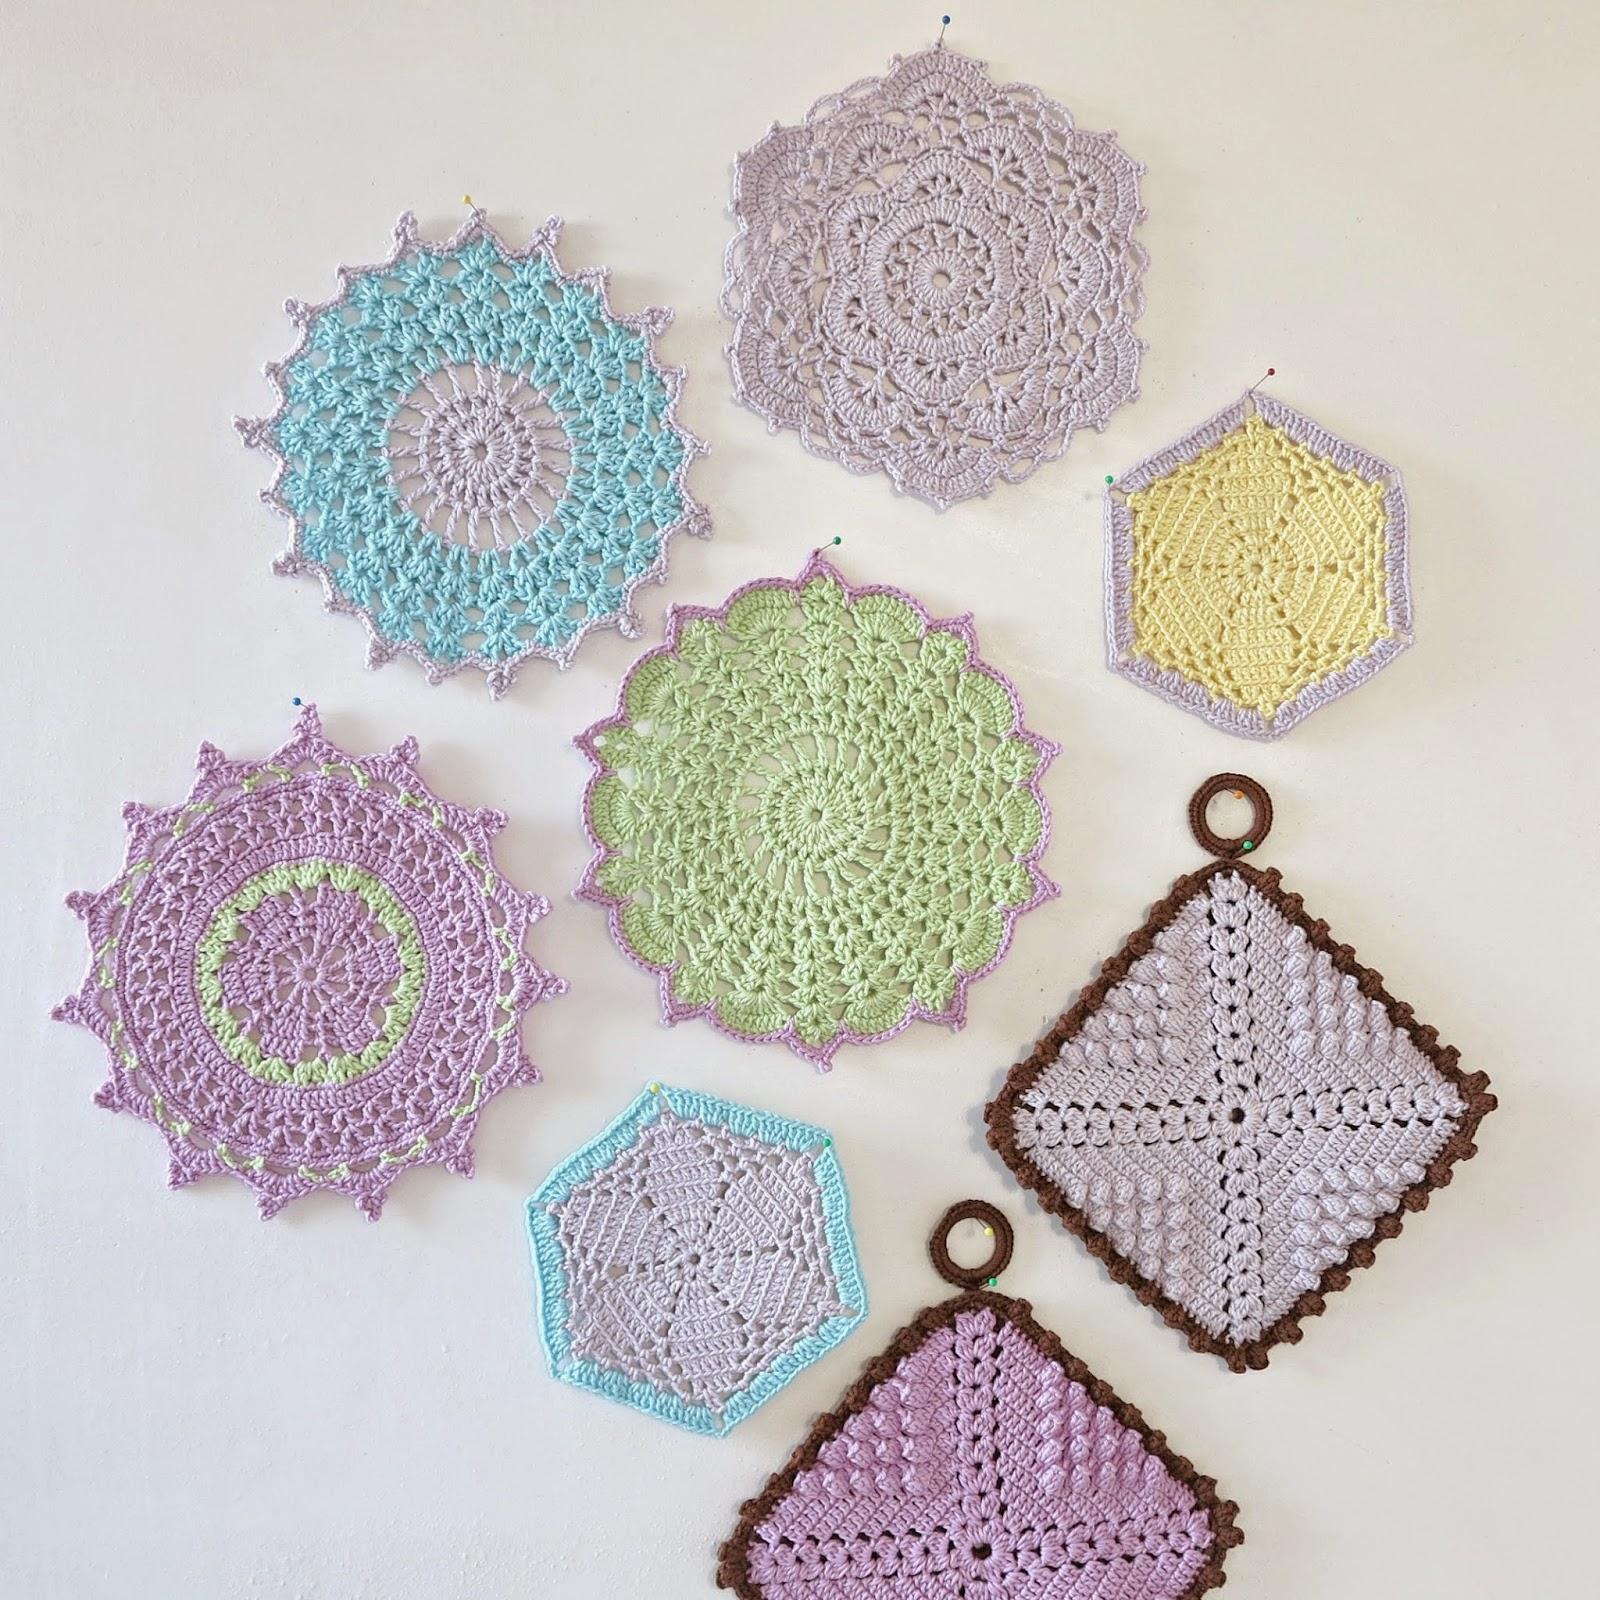 ByHaafner, crochet, potholder, doily, pastel, popcorn stitch